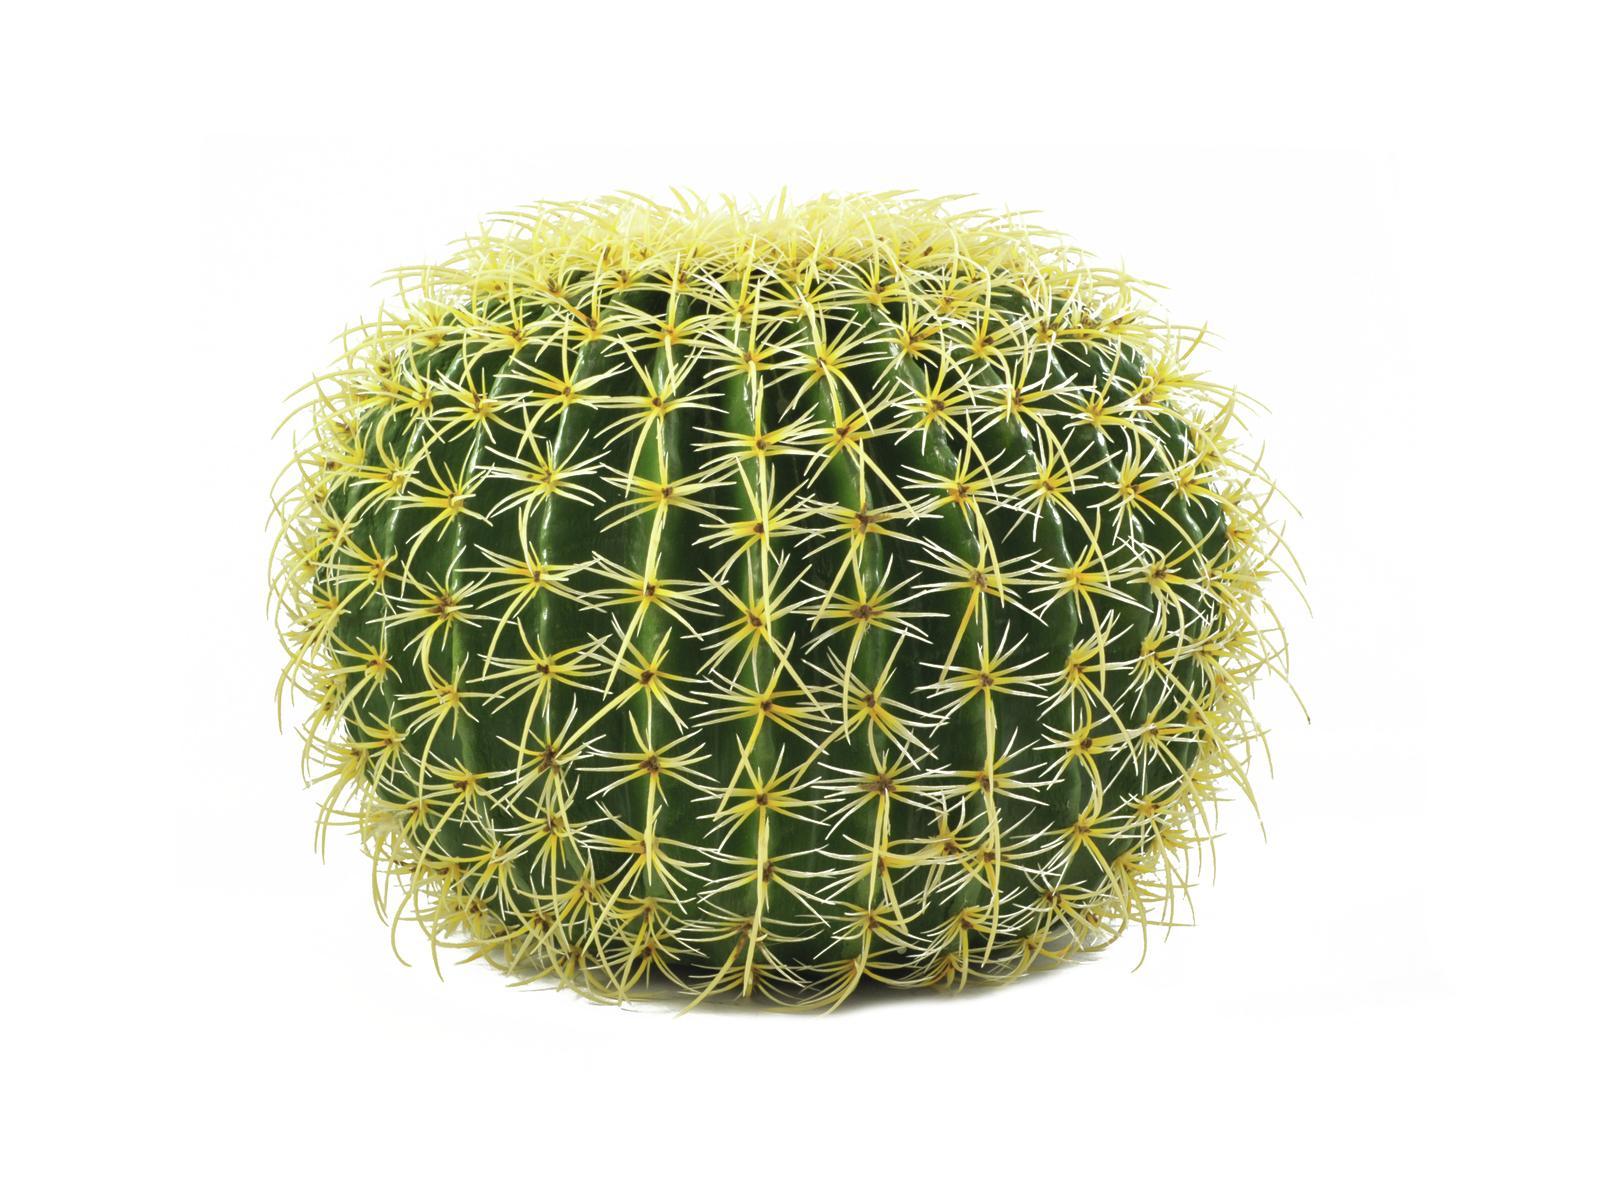 Kulatý zlatý kaktus, 48cm